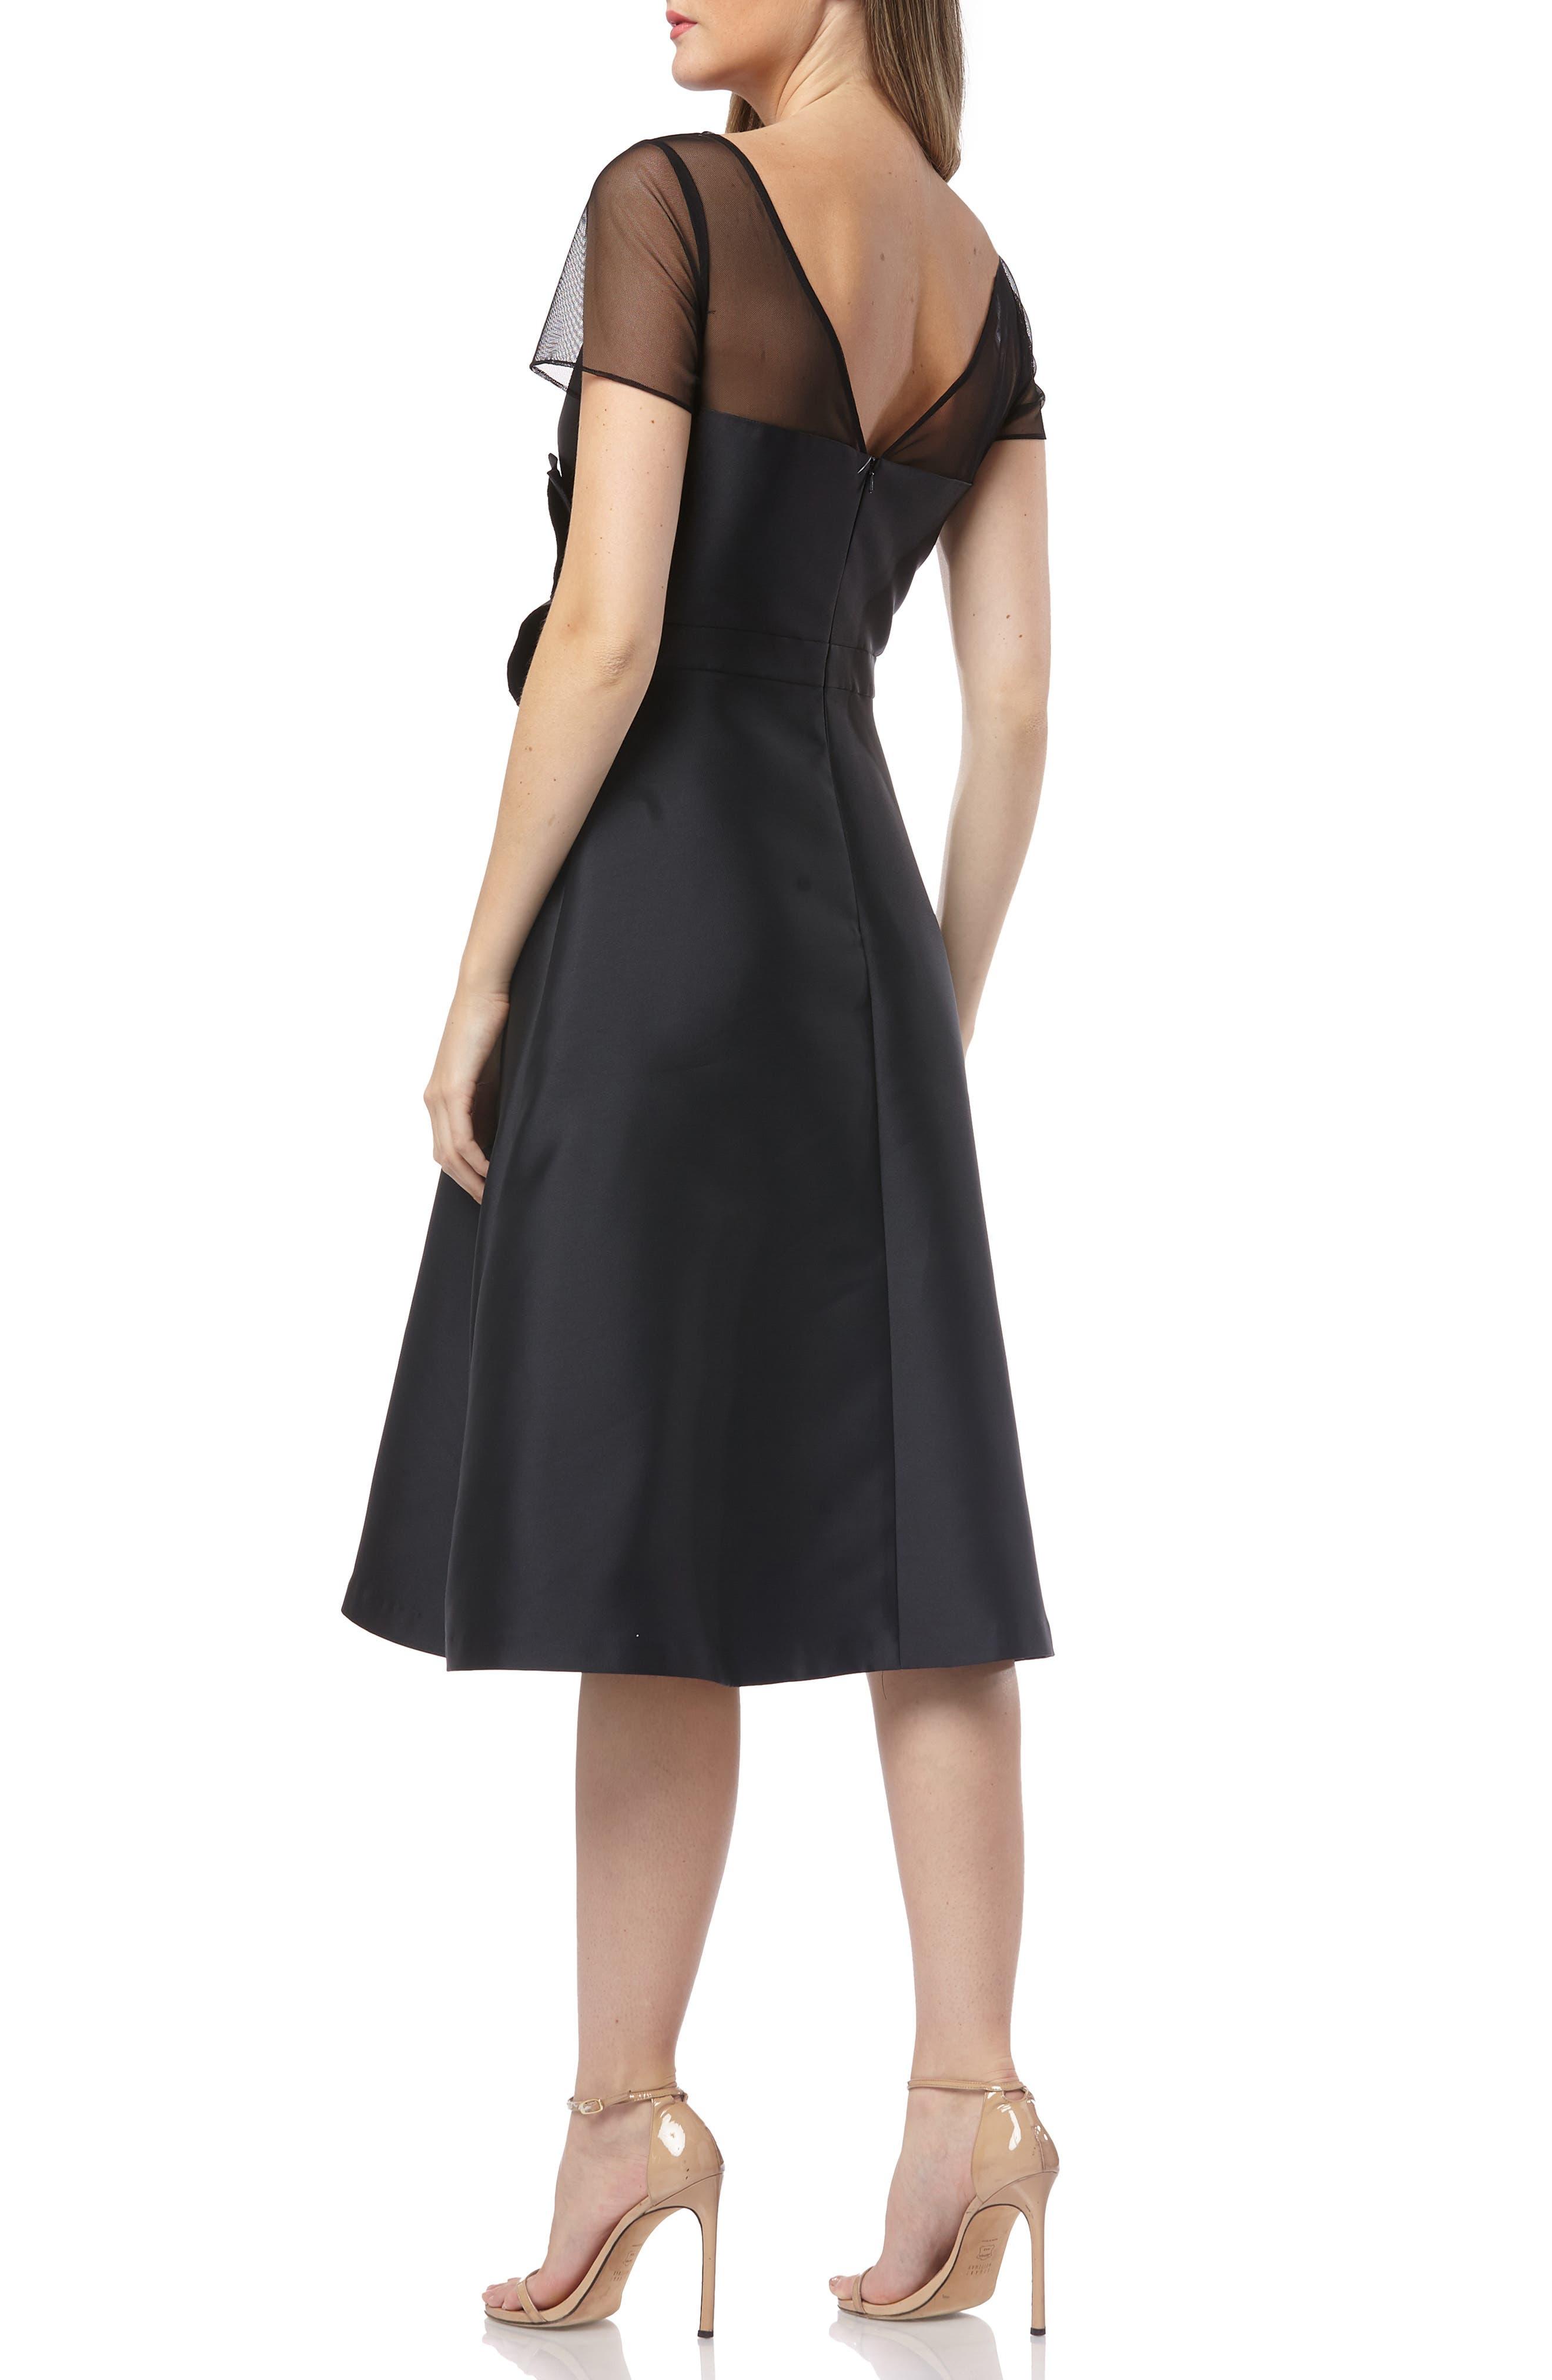 KAY UNGER,                             Illusion Yoke Fit & Flare Cocktail Dress,                             Alternate thumbnail 2, color,                             BLACK